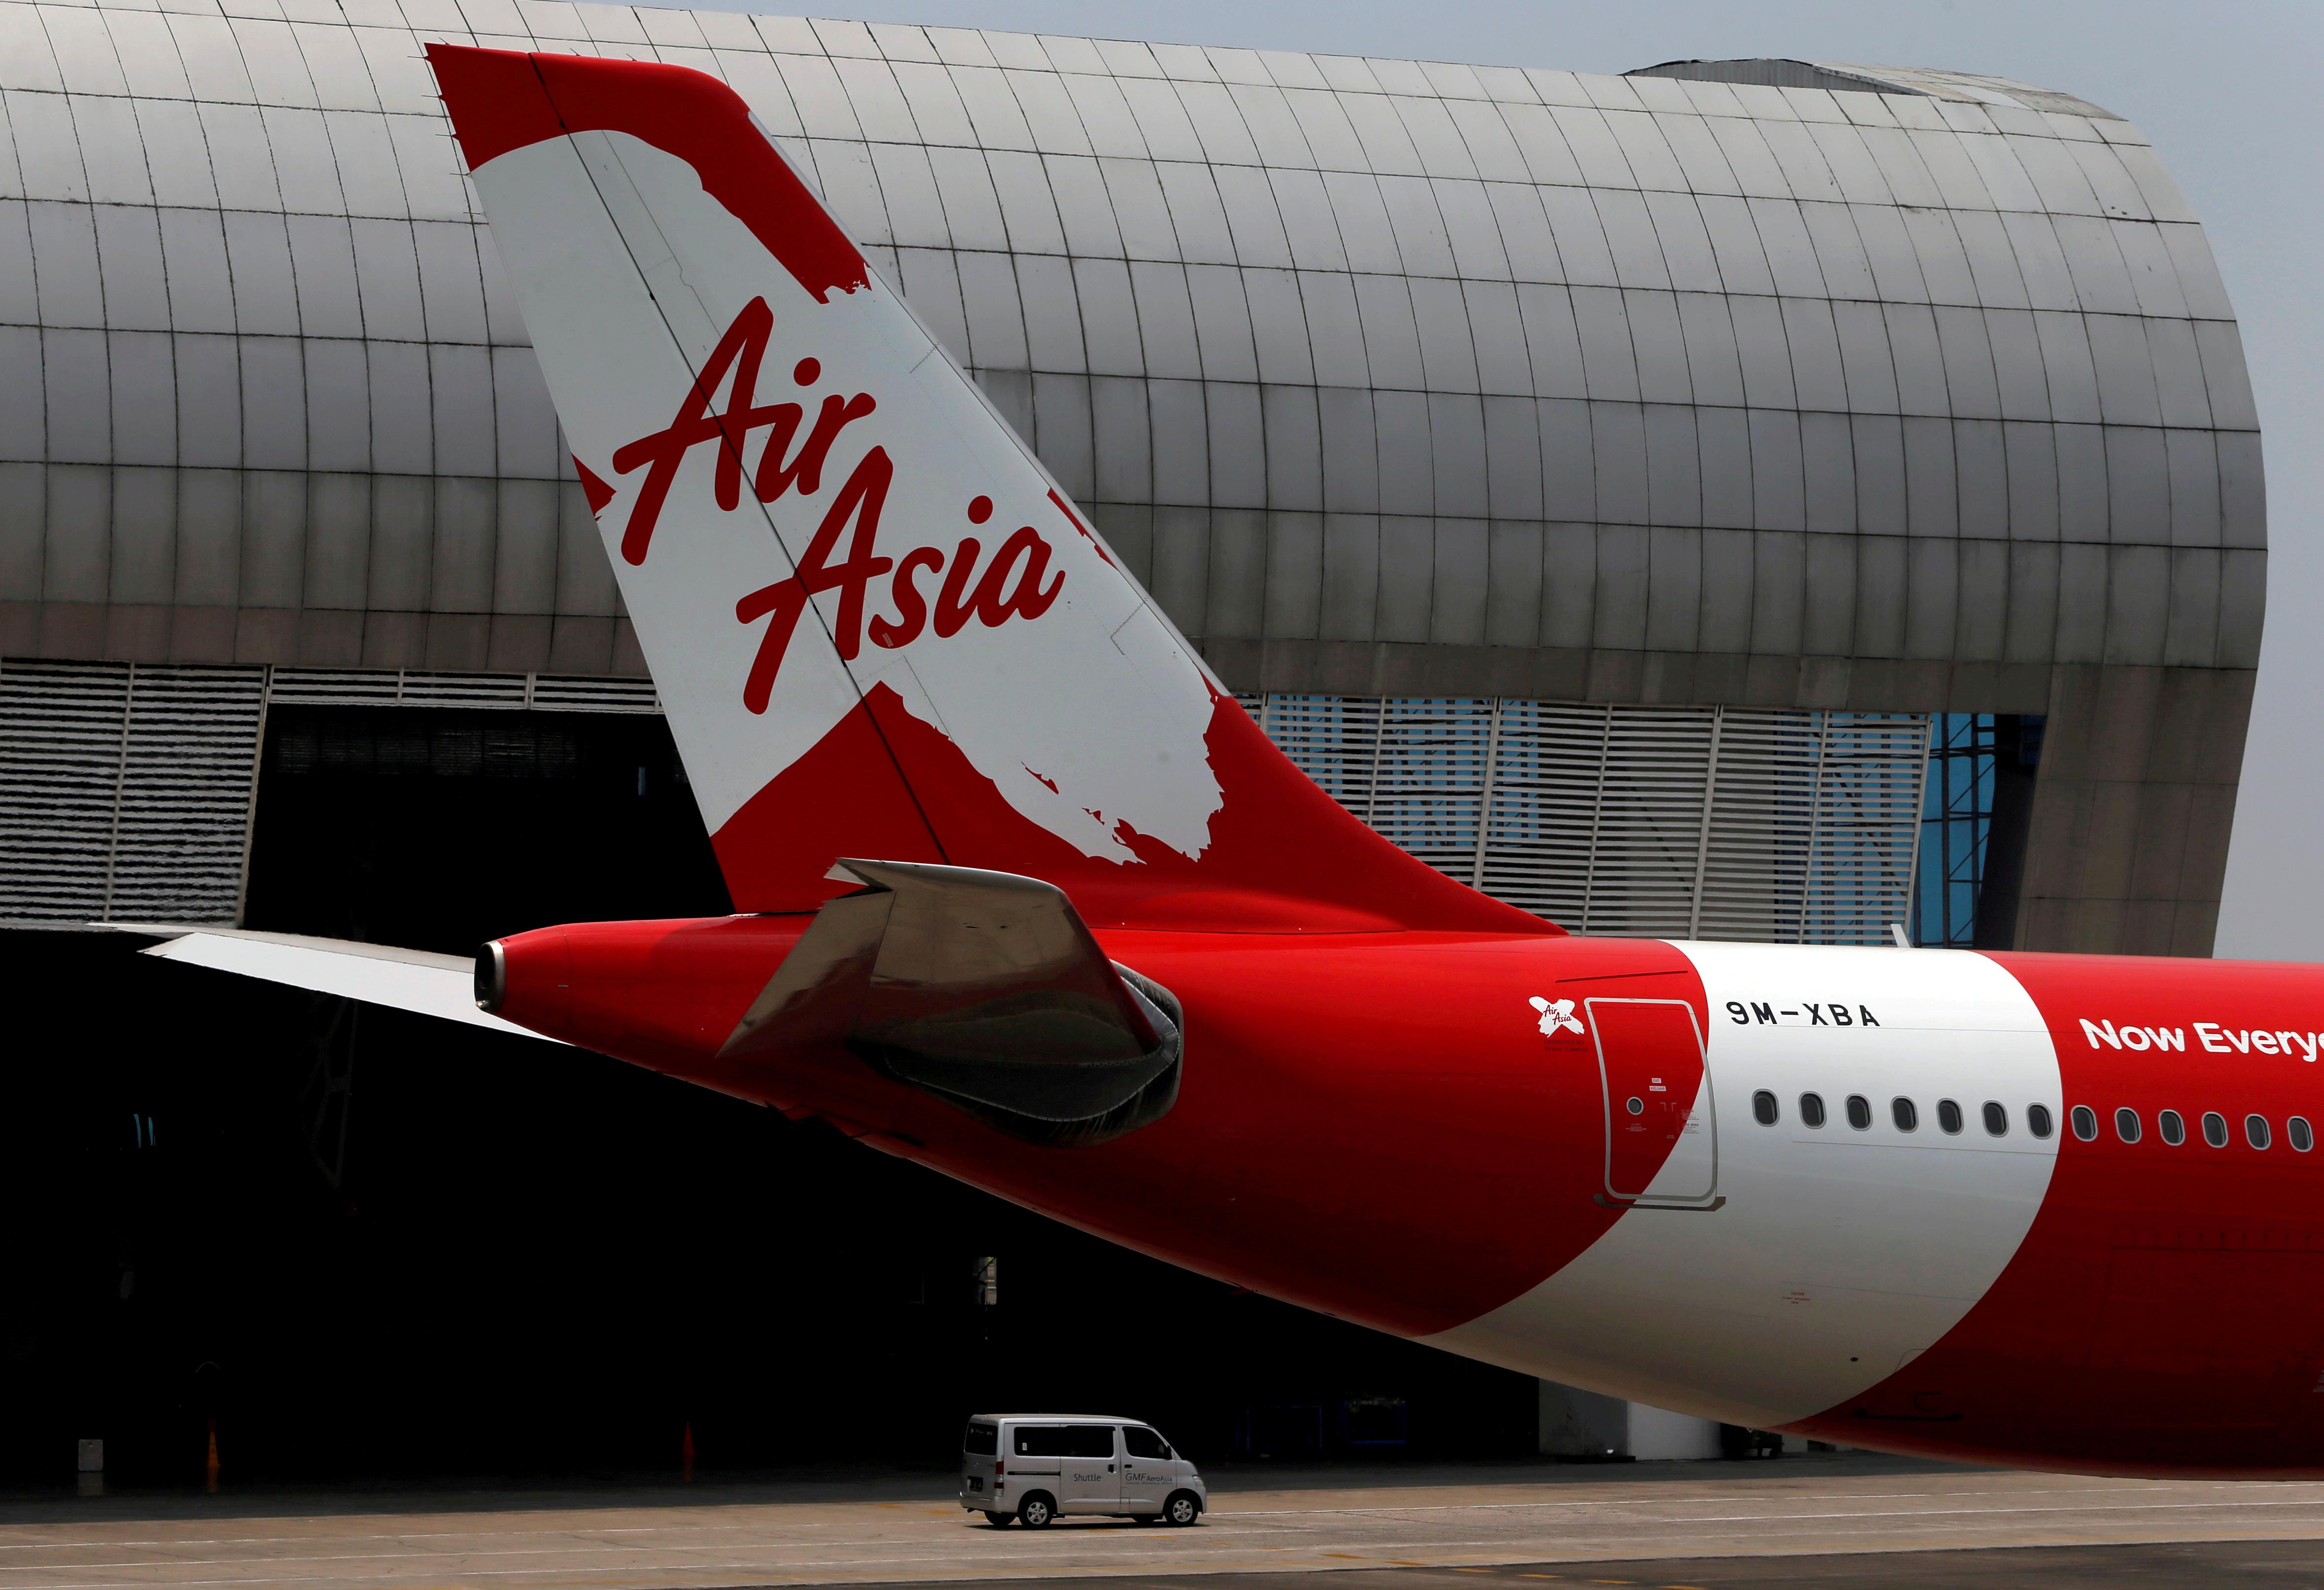 Tail of AirAsia X plane as seen at the Garuda Maintenance Facility AeroAsia in Tangerang, Indonesia, September 20, 2017.  REUTERS/Beawiharta/File Photo/File Photo